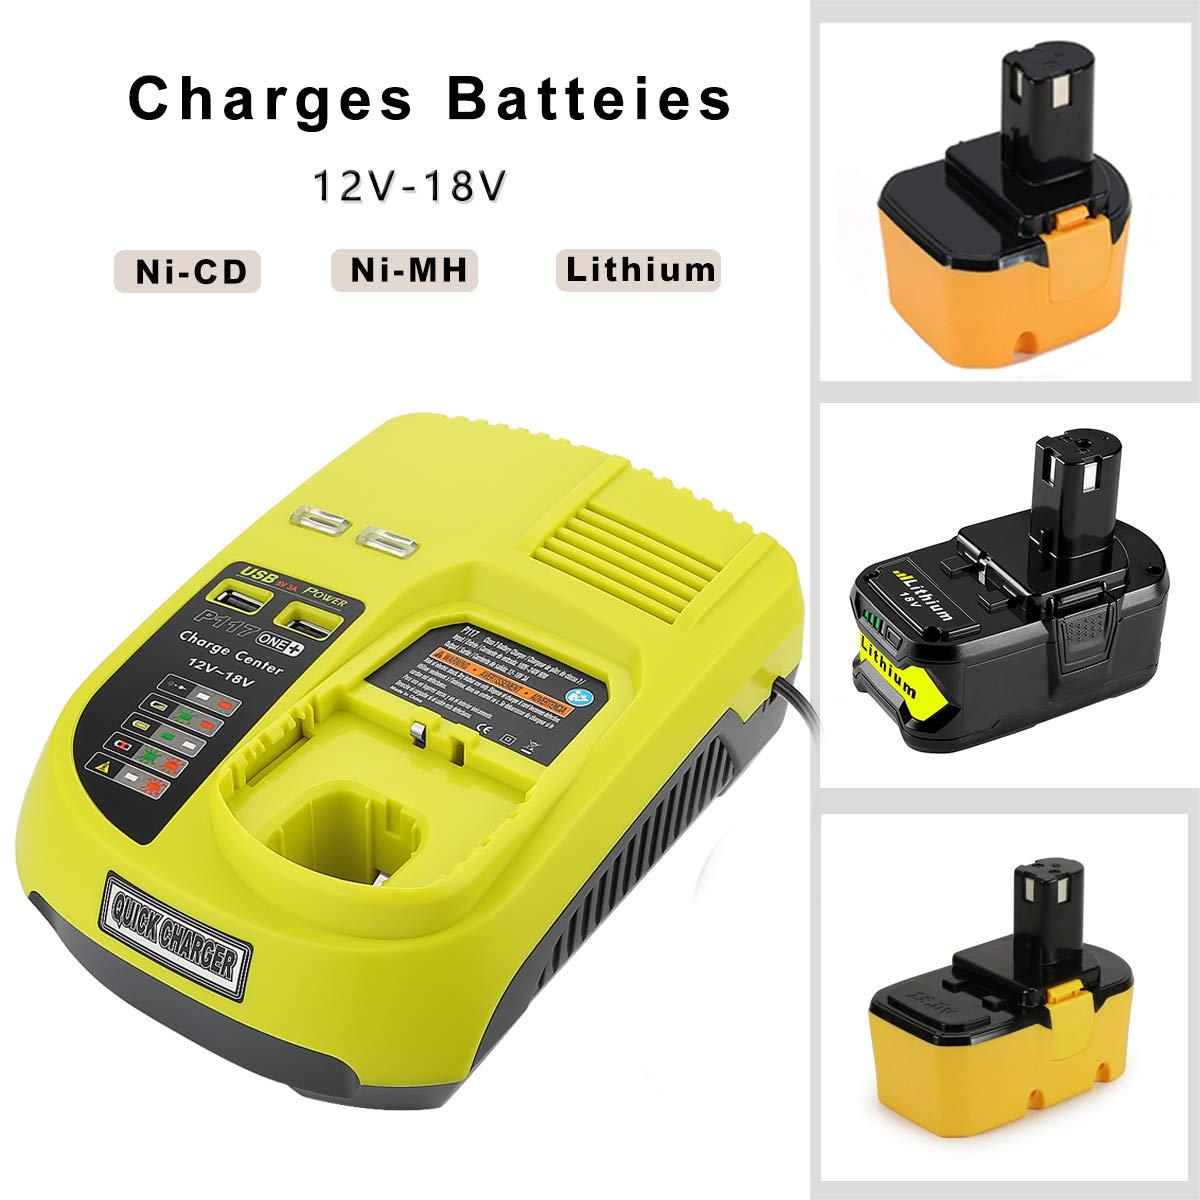 12v-18V For Ryobi P117 Rechargeable Battery Charger Battery Pack Power Tool Ni-Cd Ni-Mh Li-Ion P110, P111, P107